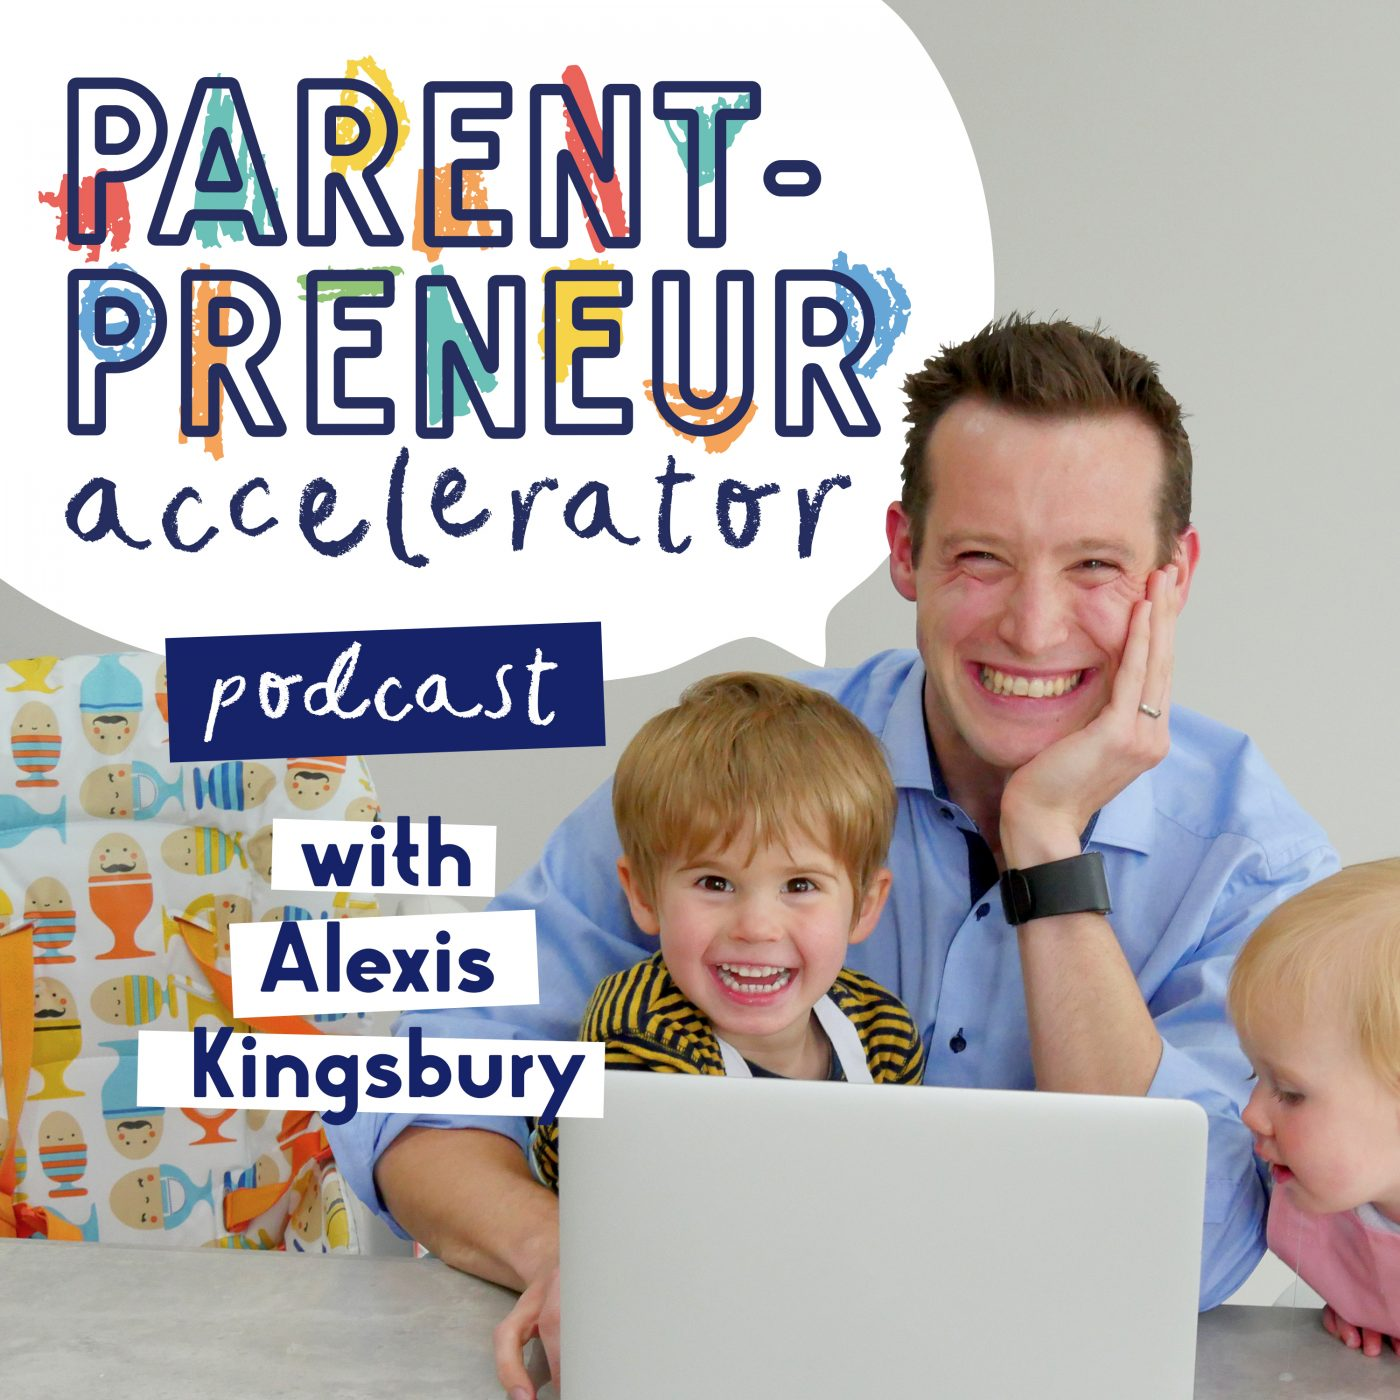 The Parentpreneur Accelerator Podcast show art